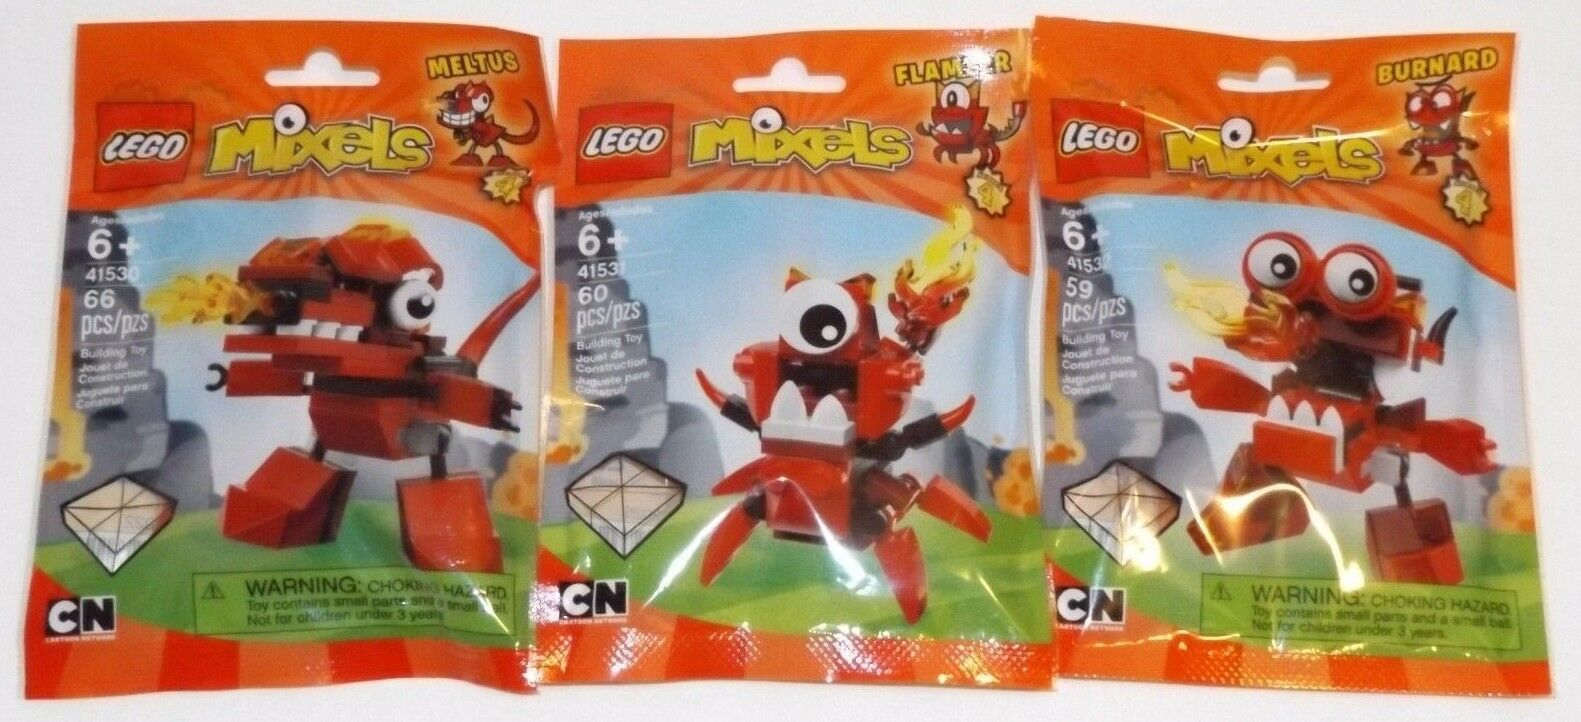 Lego Mixels Series 4 INFERNITES tribe  Meltus Flamzer Burnard red complete set